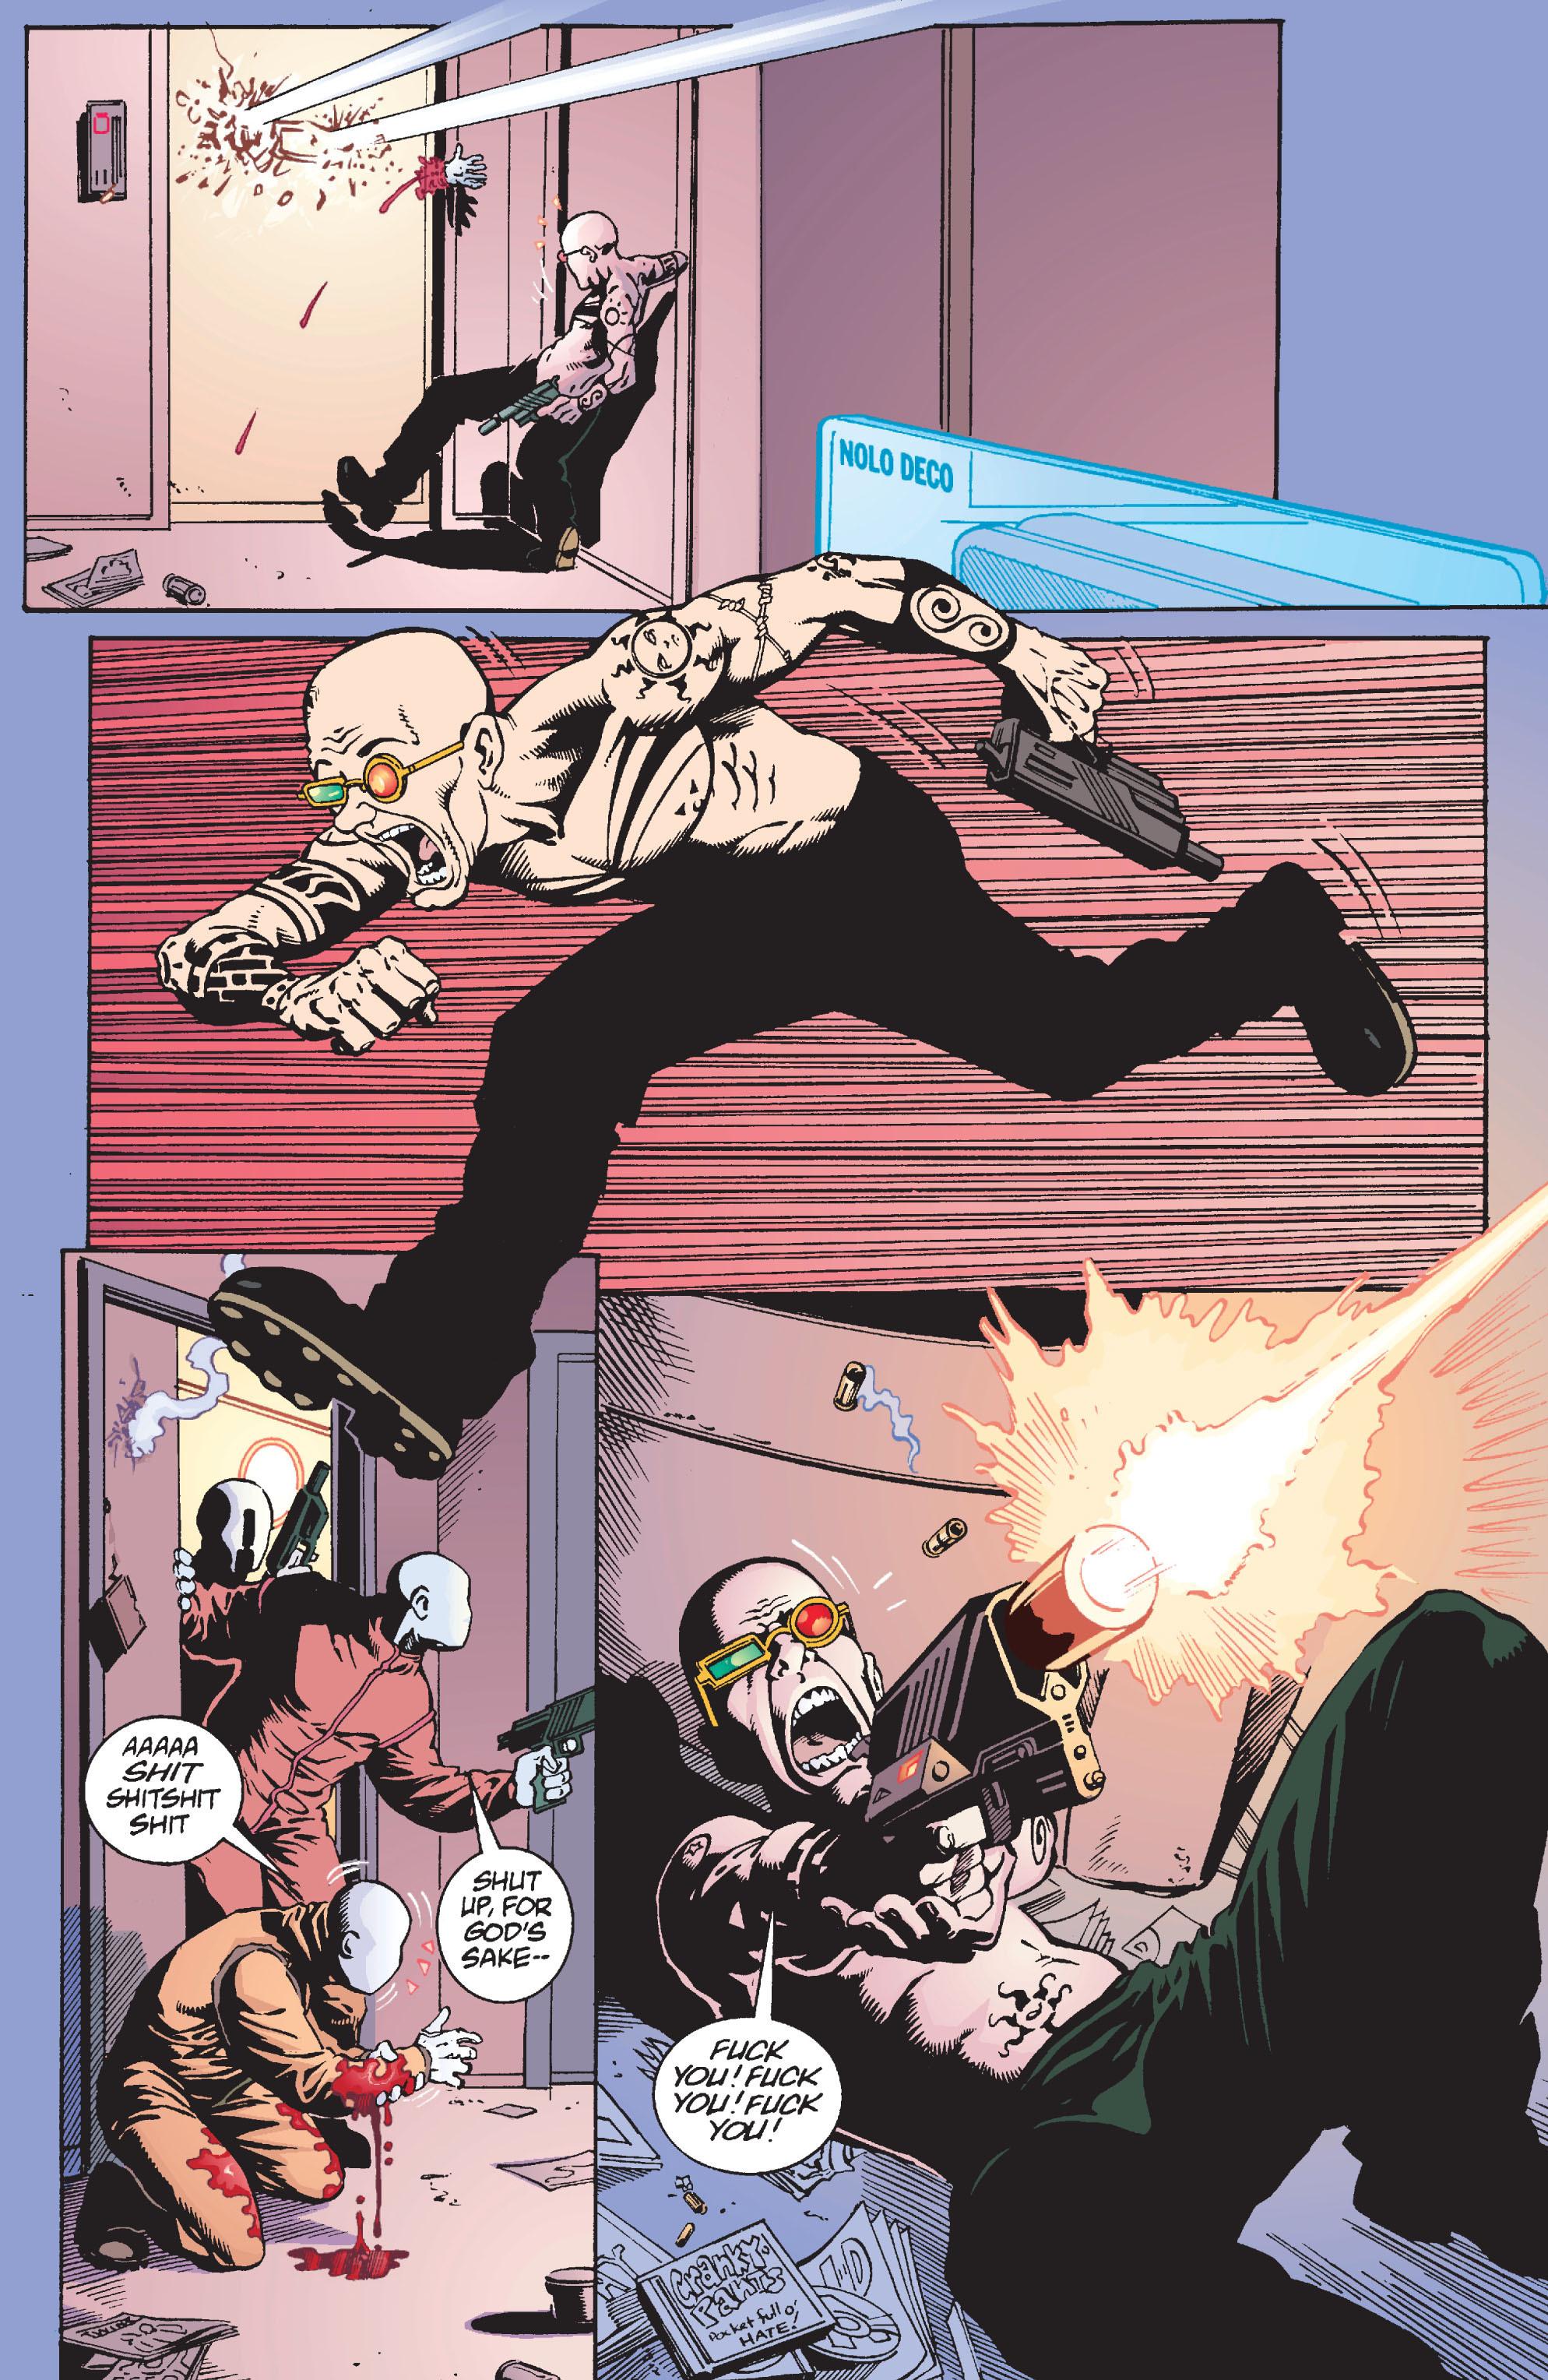 Read online Transmetropolitan comic -  Issue #10 - 9